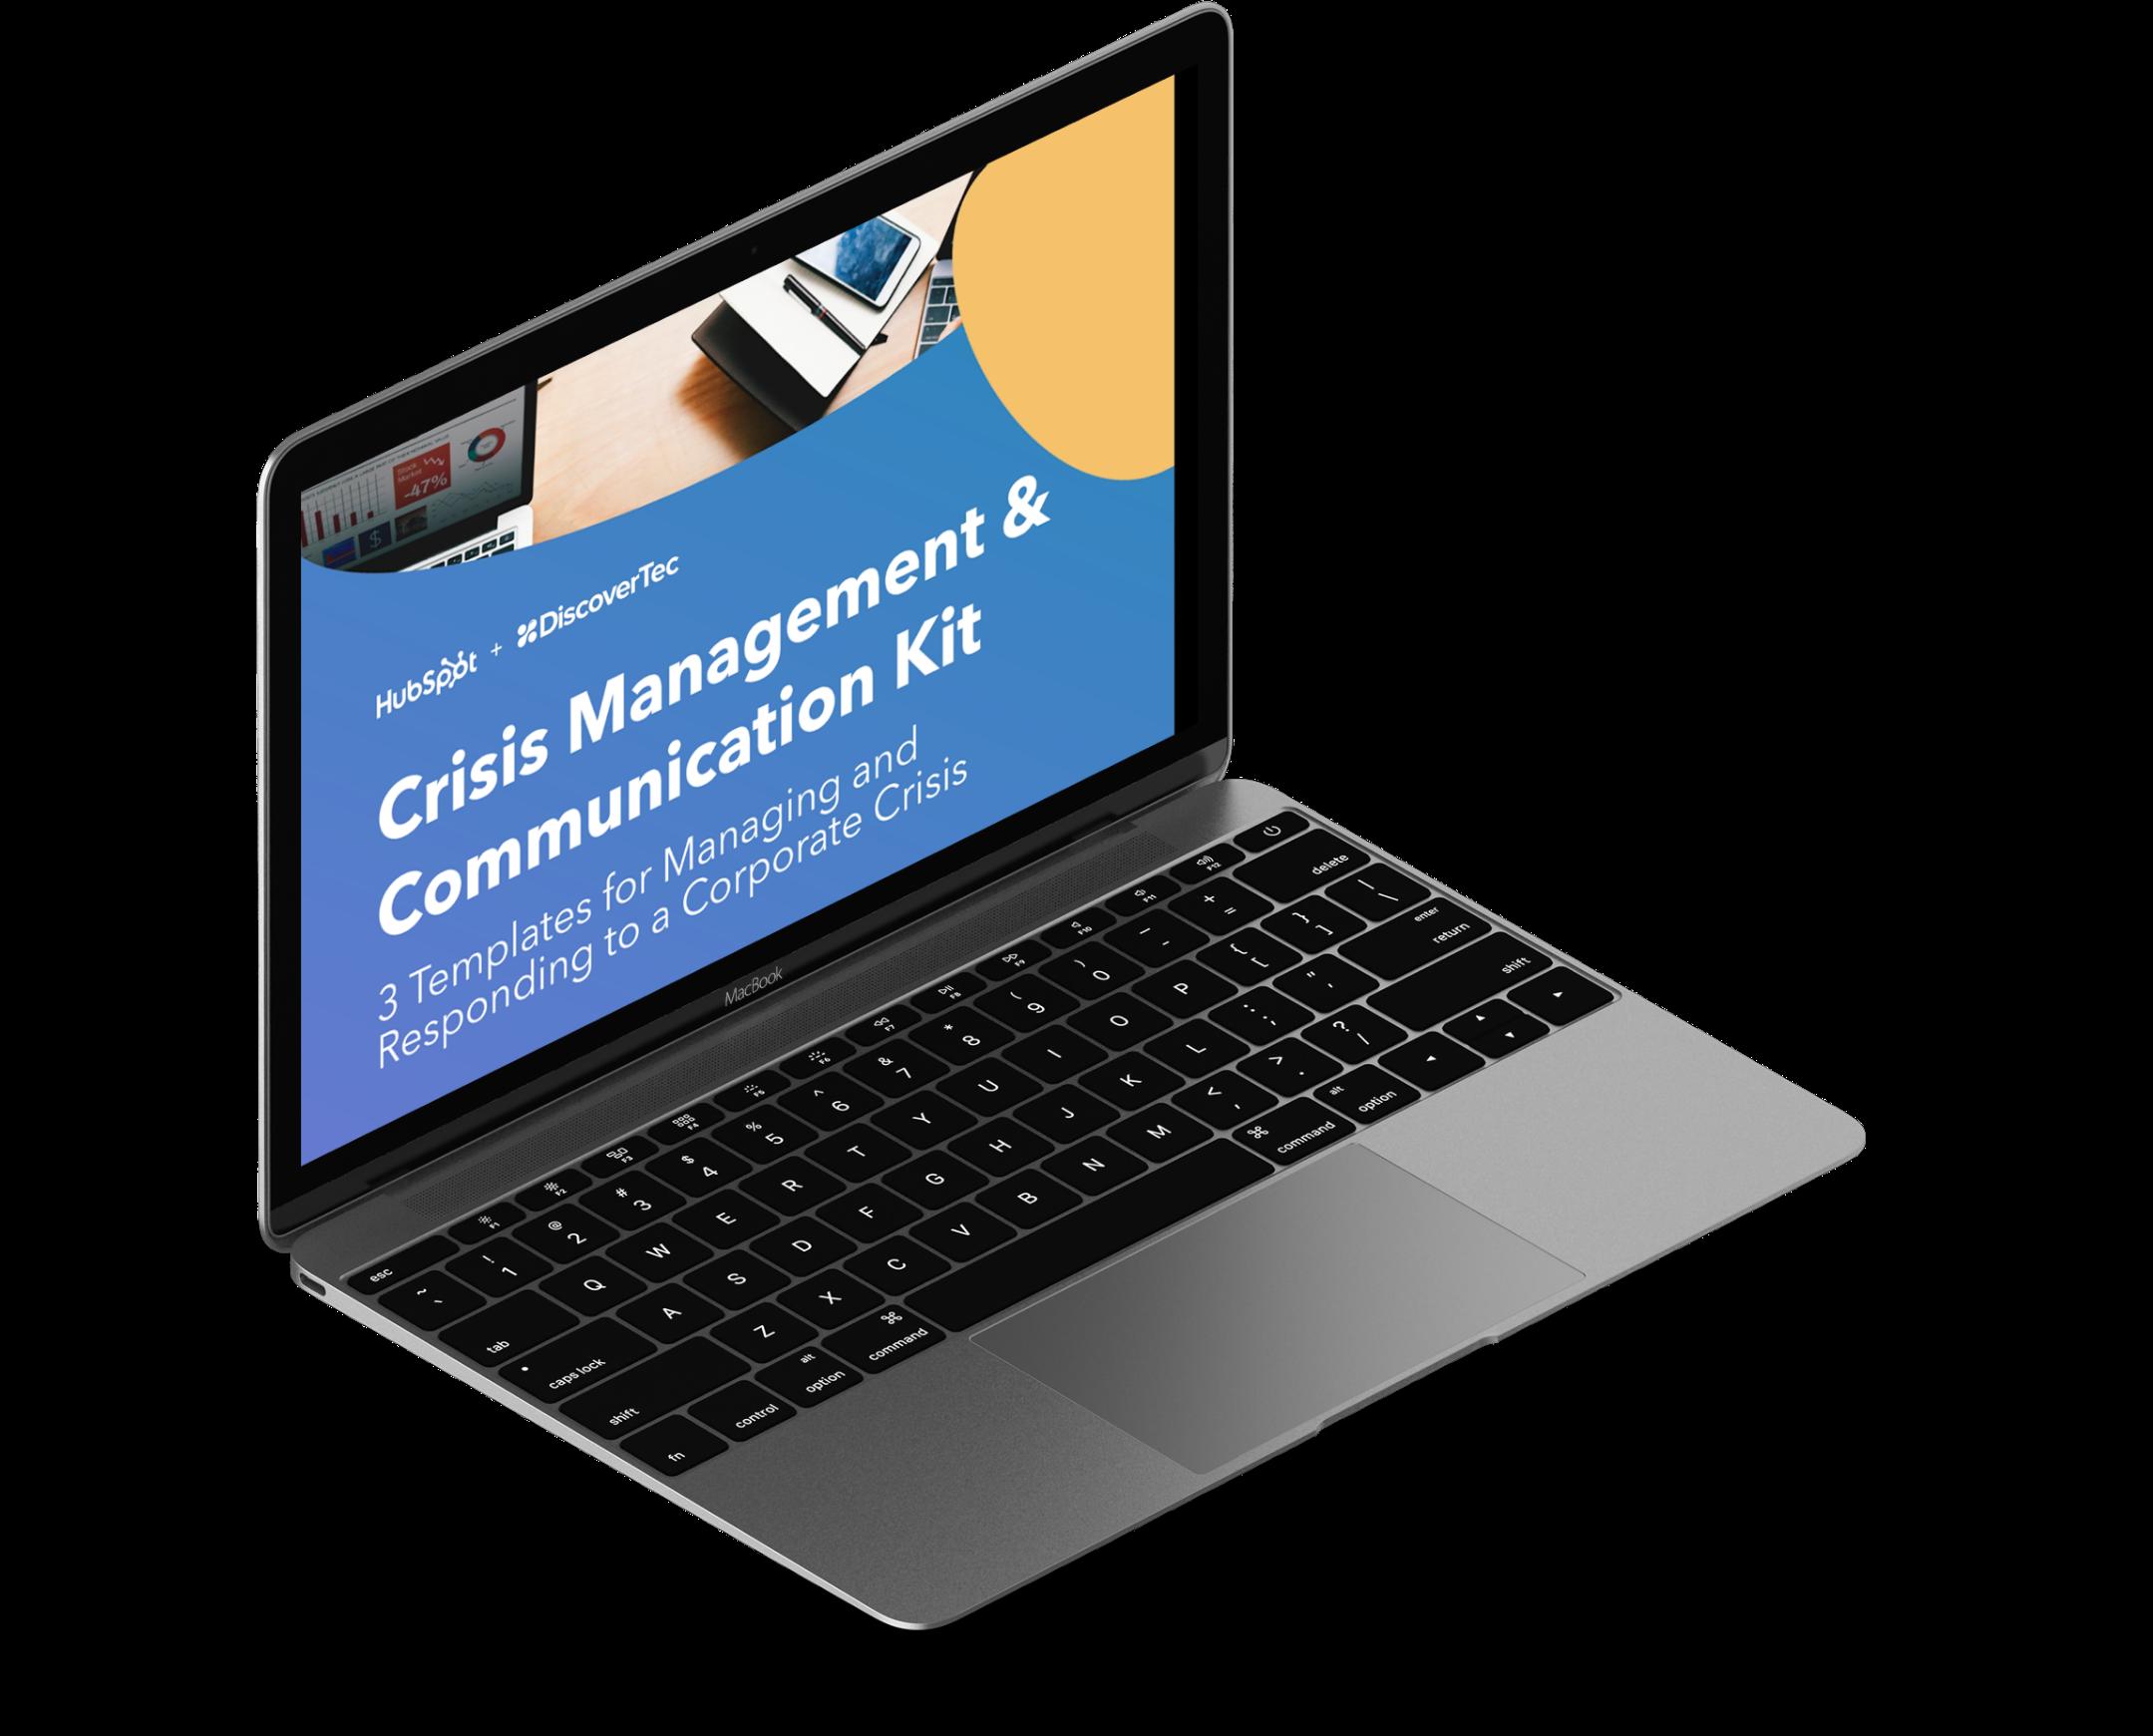 Crisis Management & Communication Kit